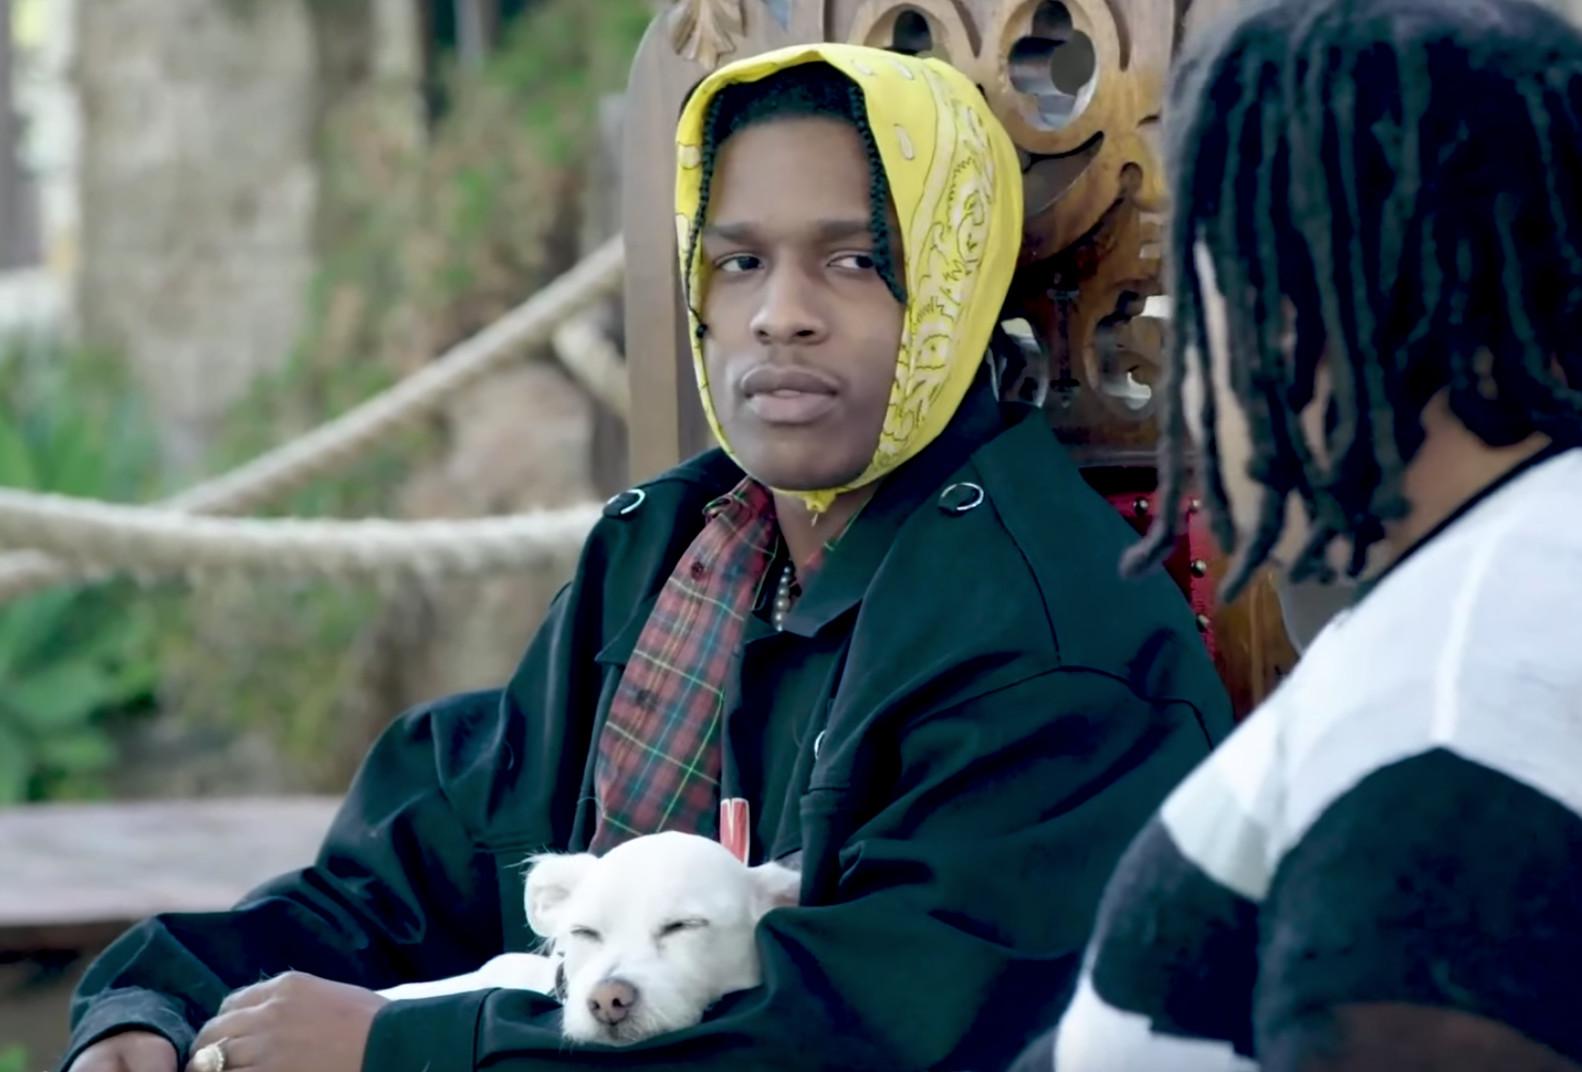 ASAP Rocky Breaks Down Twelvyy's Role in the Development of Virgil Abloh's Off-White